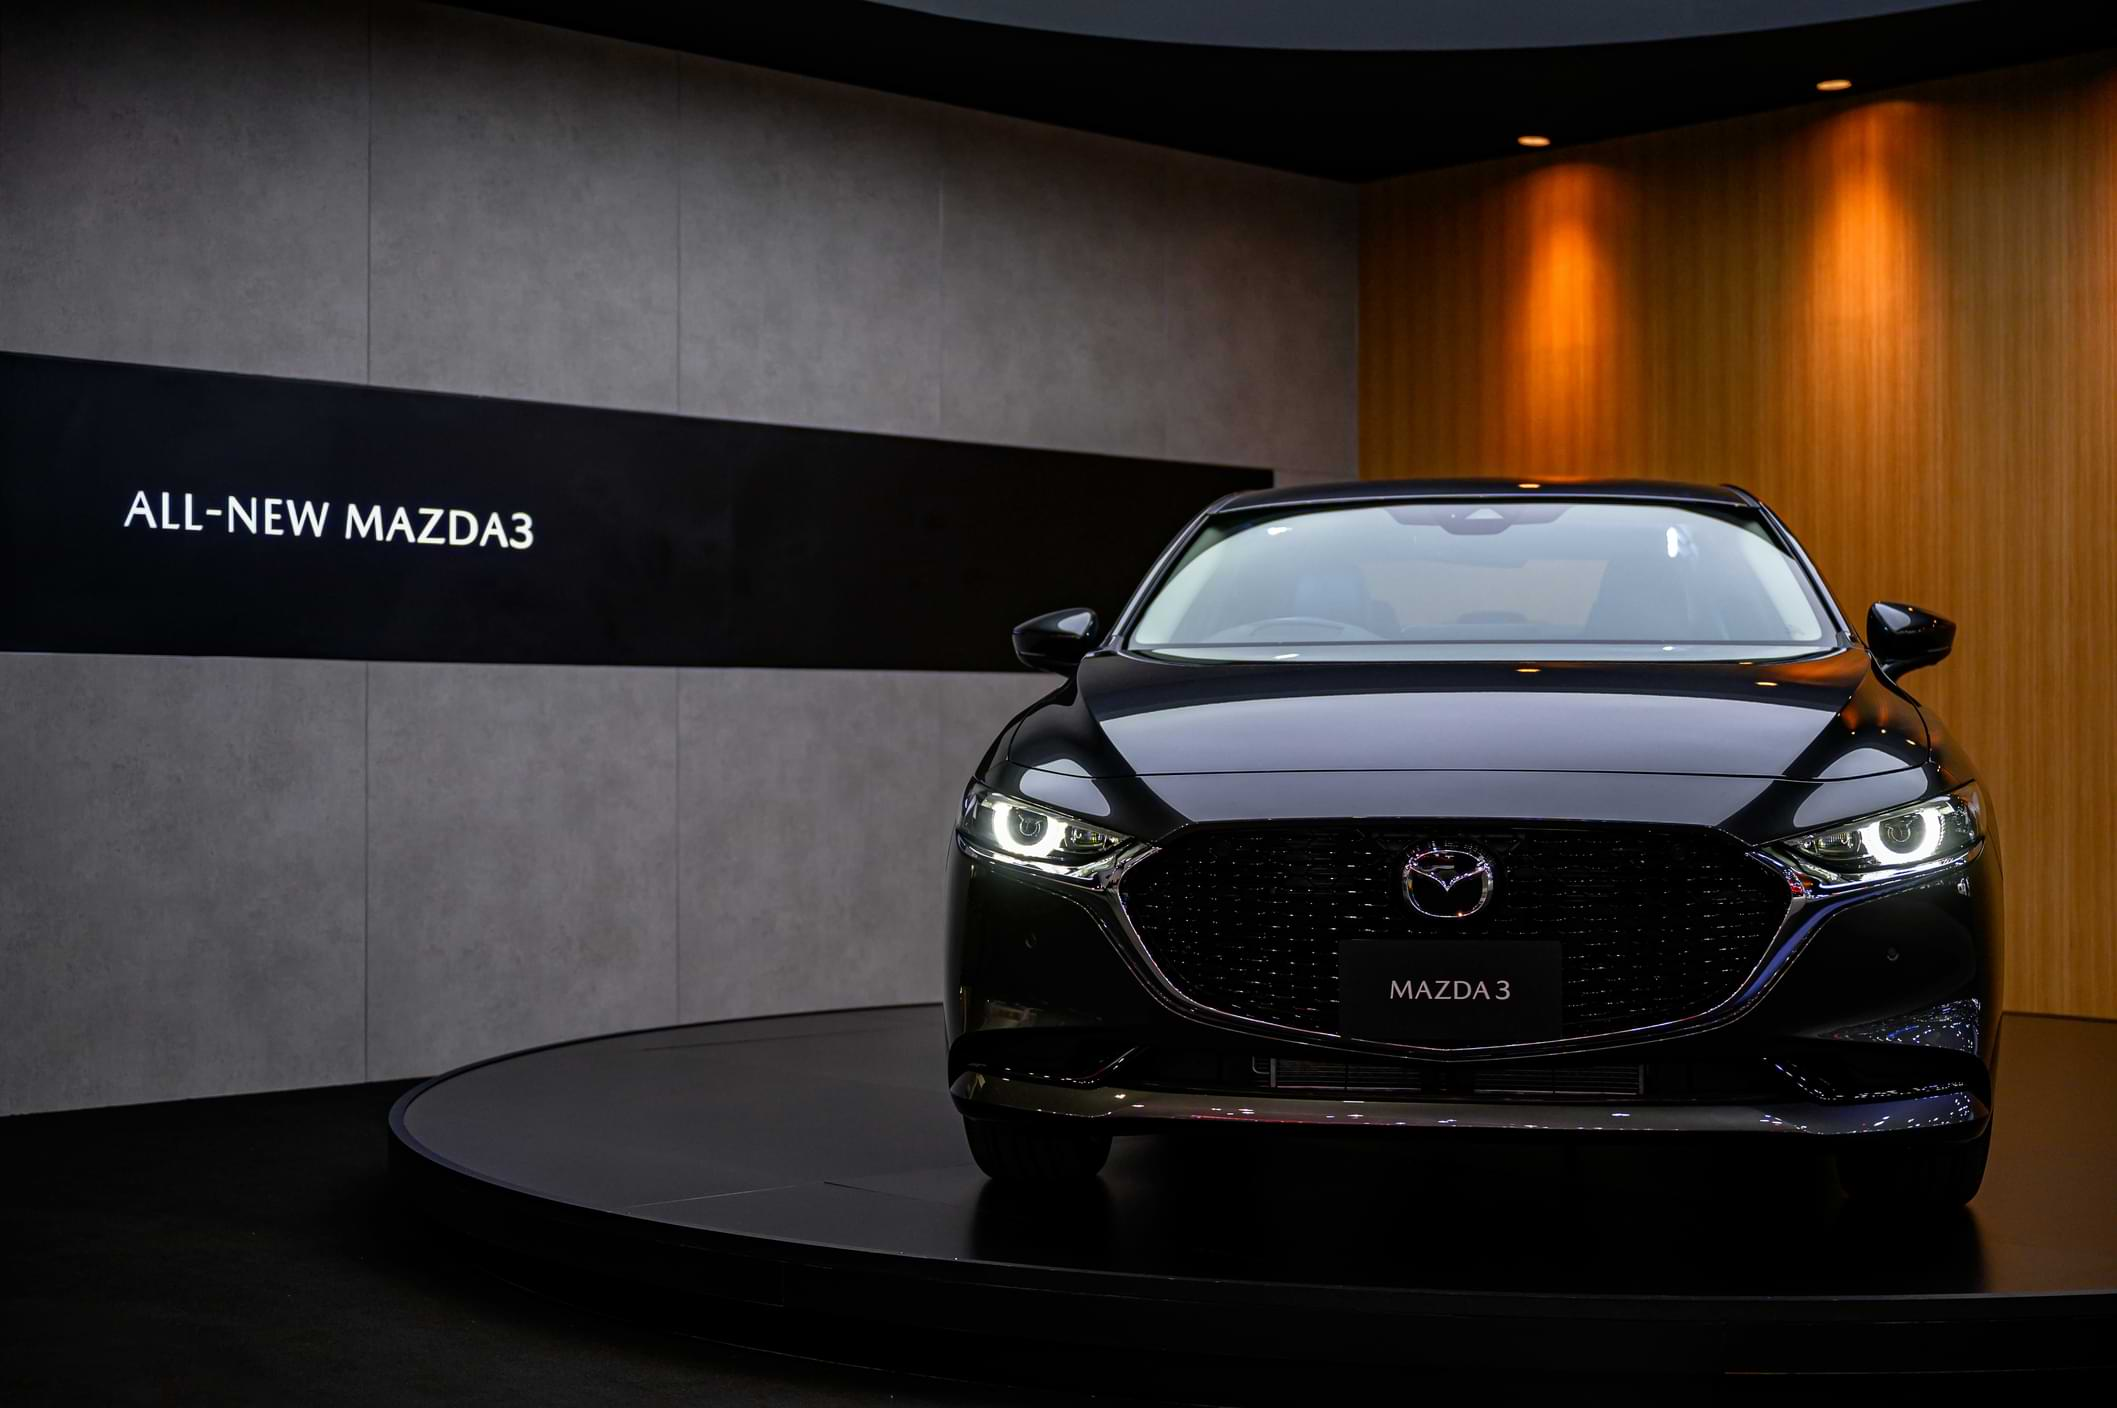 All New Mazda 3 sedán